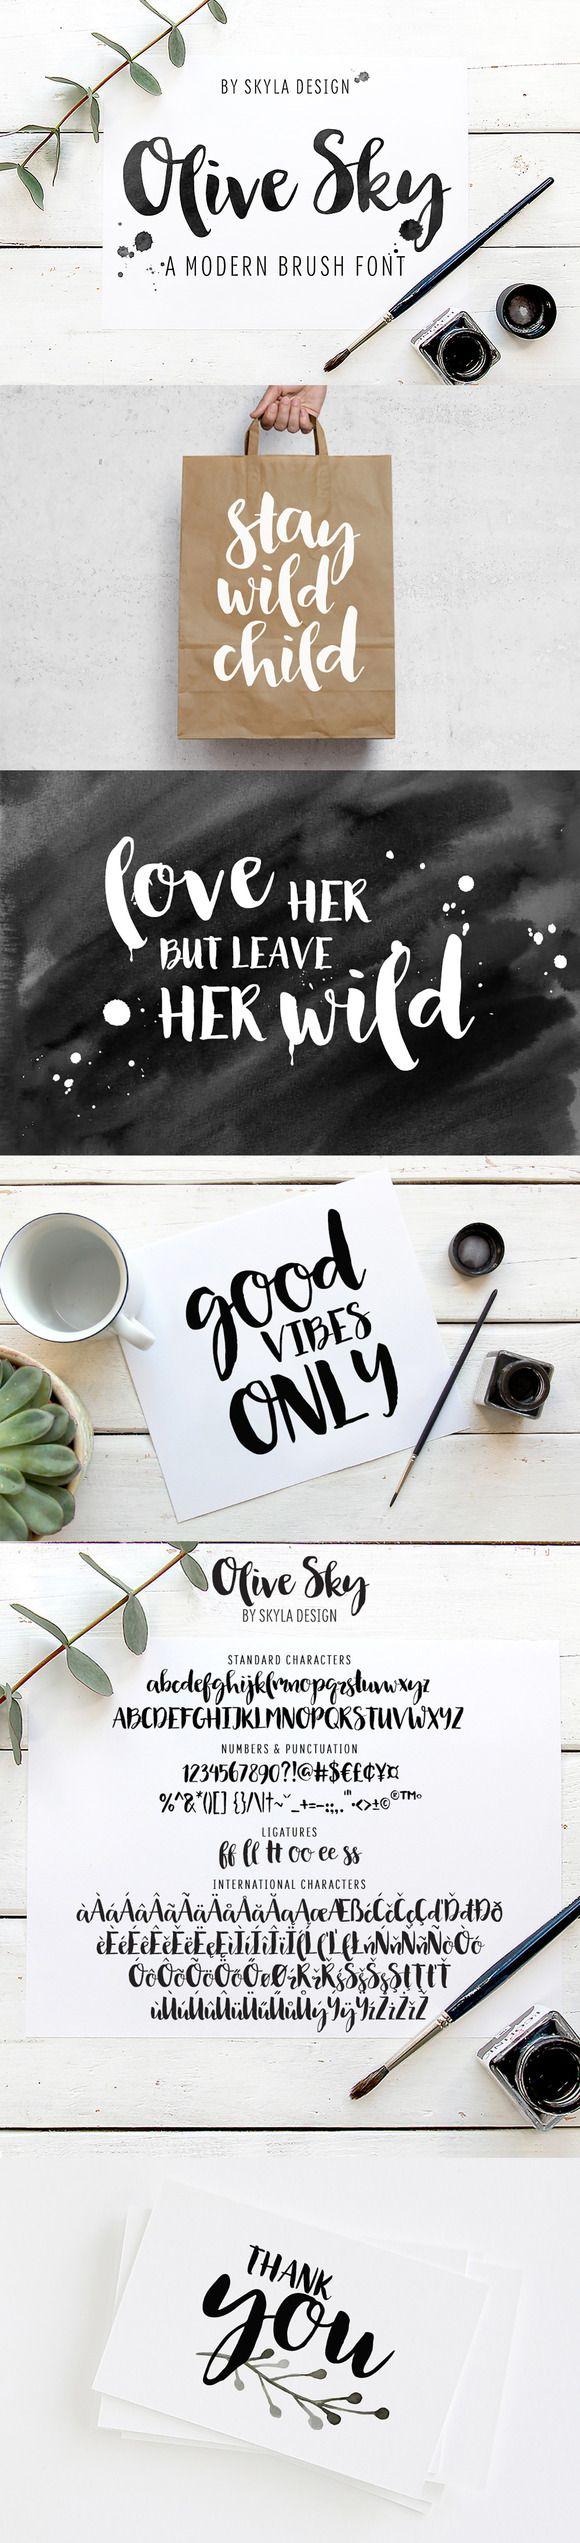 Modern brush font - Olive Sky  by skyladesign on @creativemarket